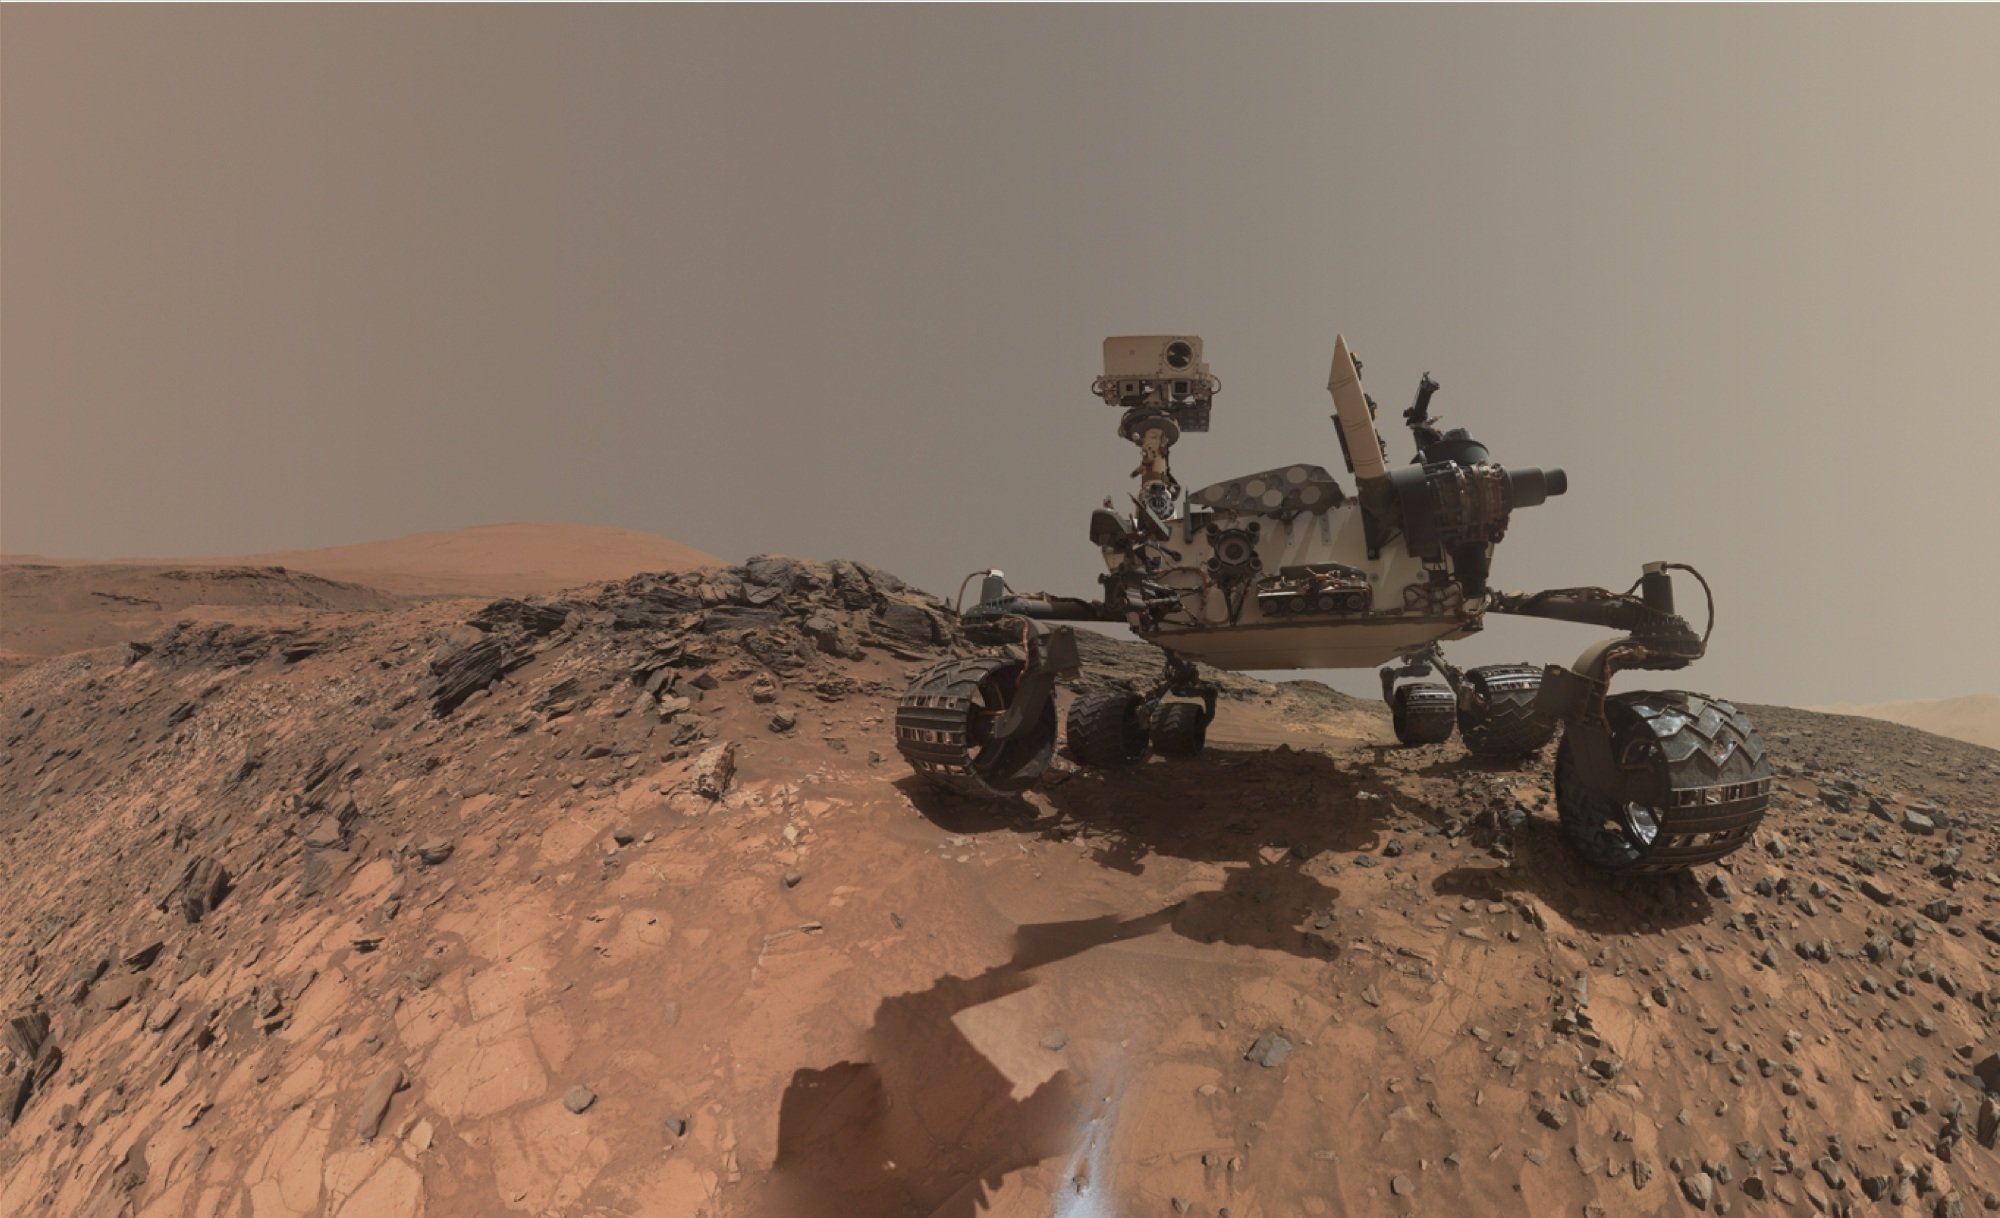 mars-curiosity-rover-msl-horizon-sky-self-portrait-pia19808-full